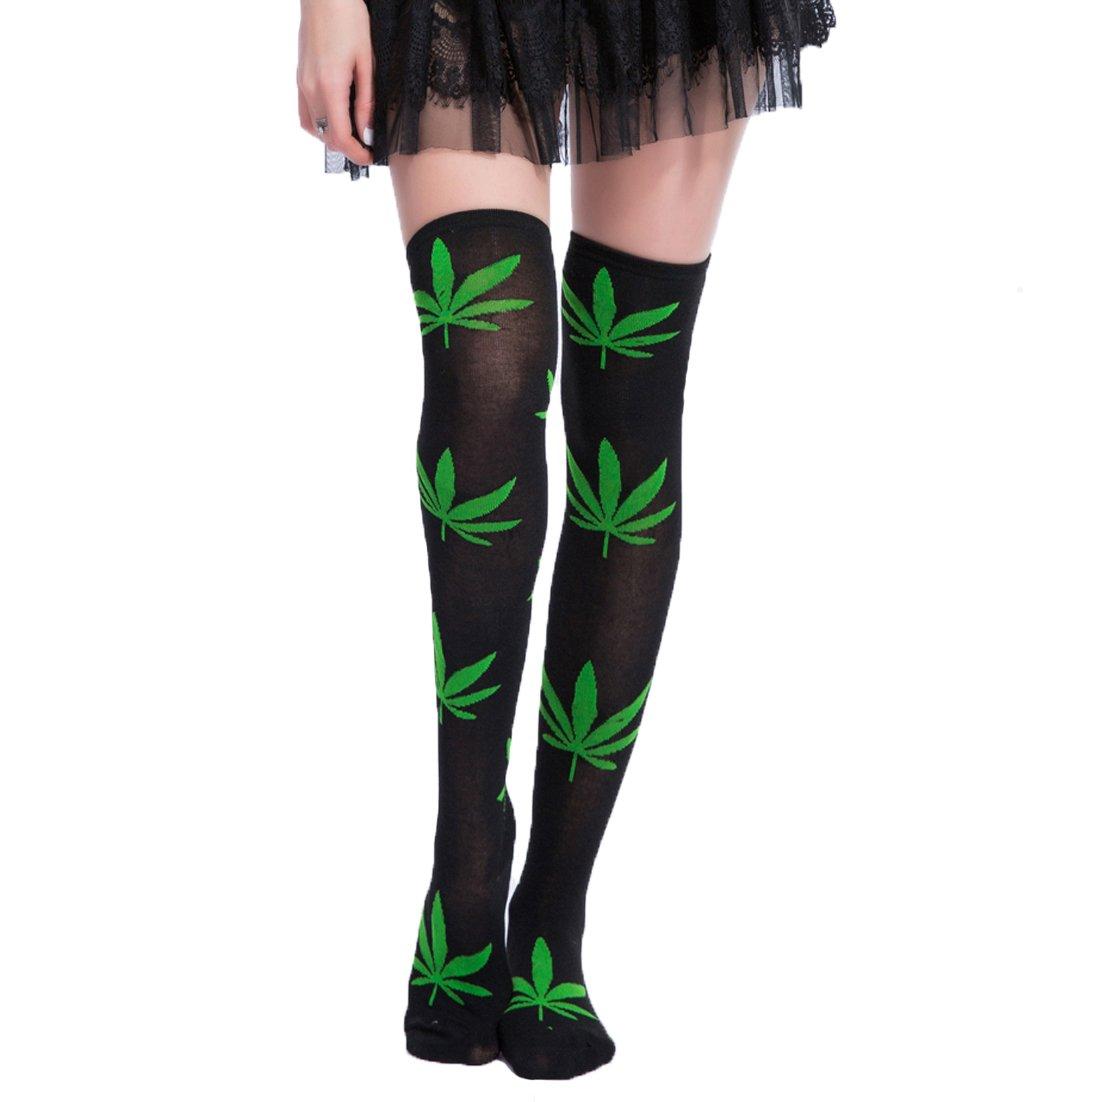 Girls Women Long Over Knee High Socks Marijuana Leaf Animal Costume Stockings